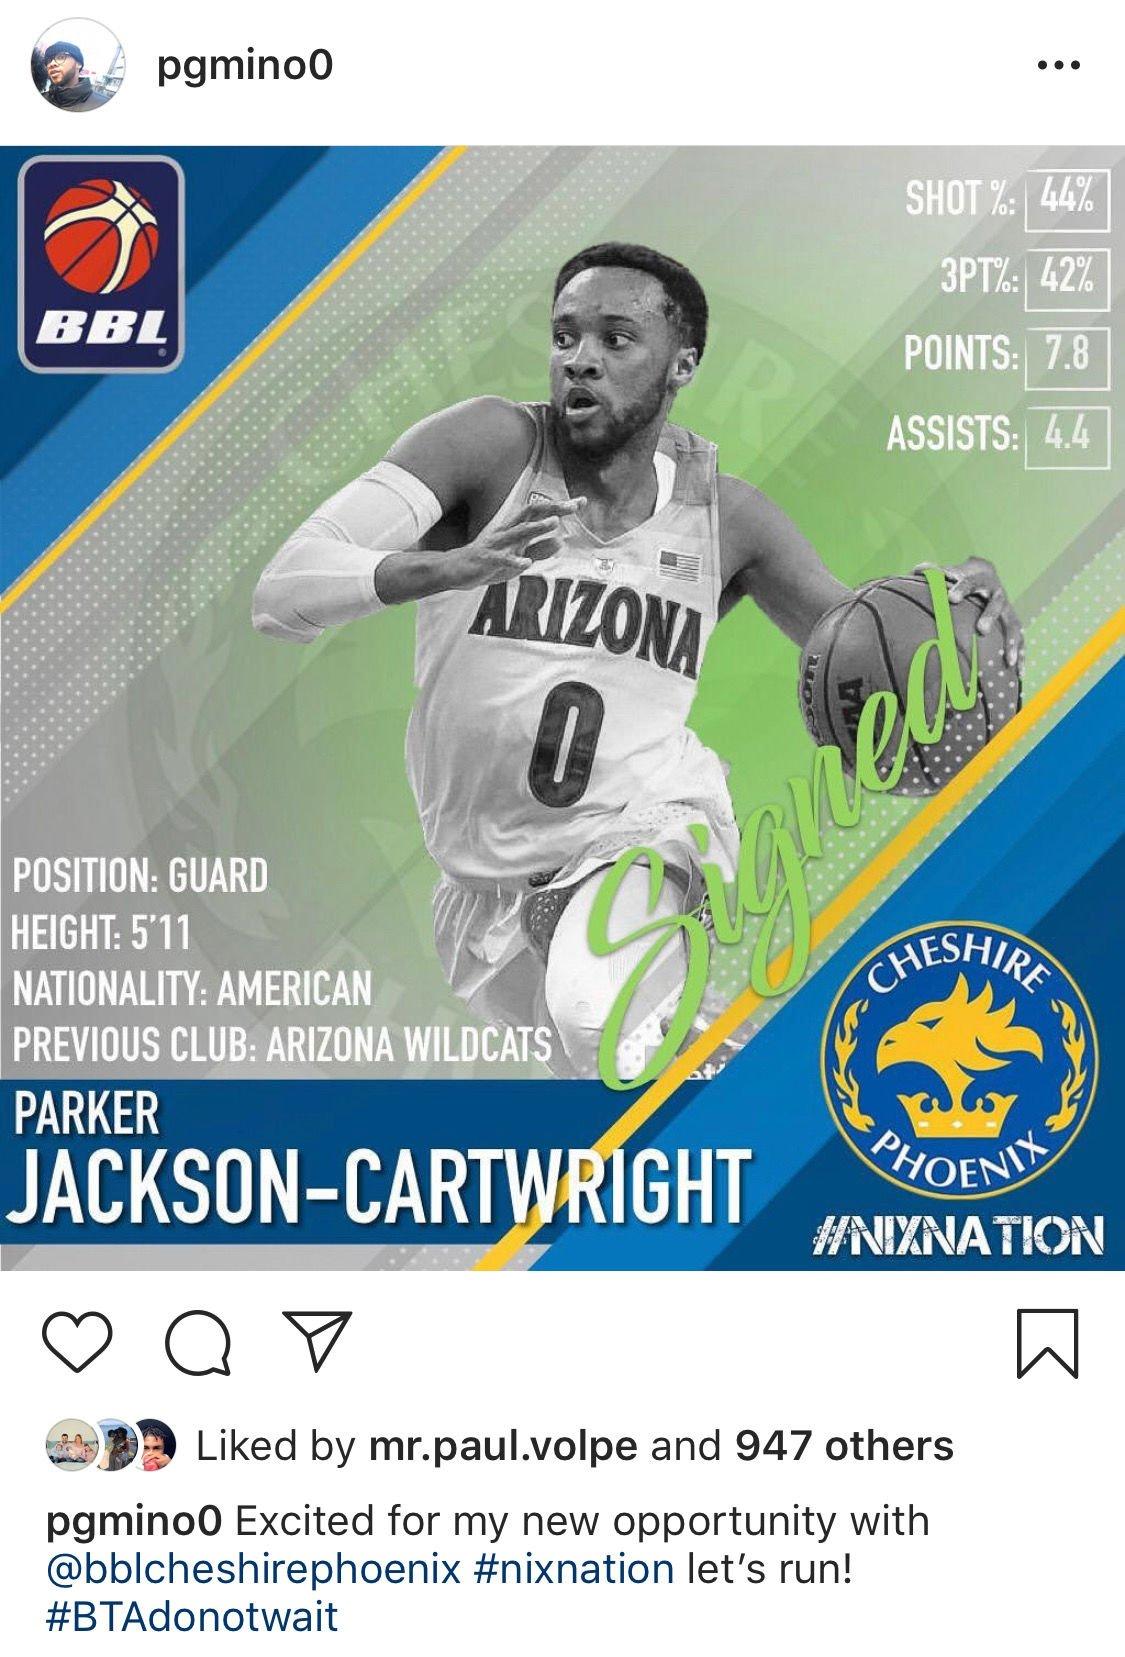 Parker Jackson-Cartwright Instagram post